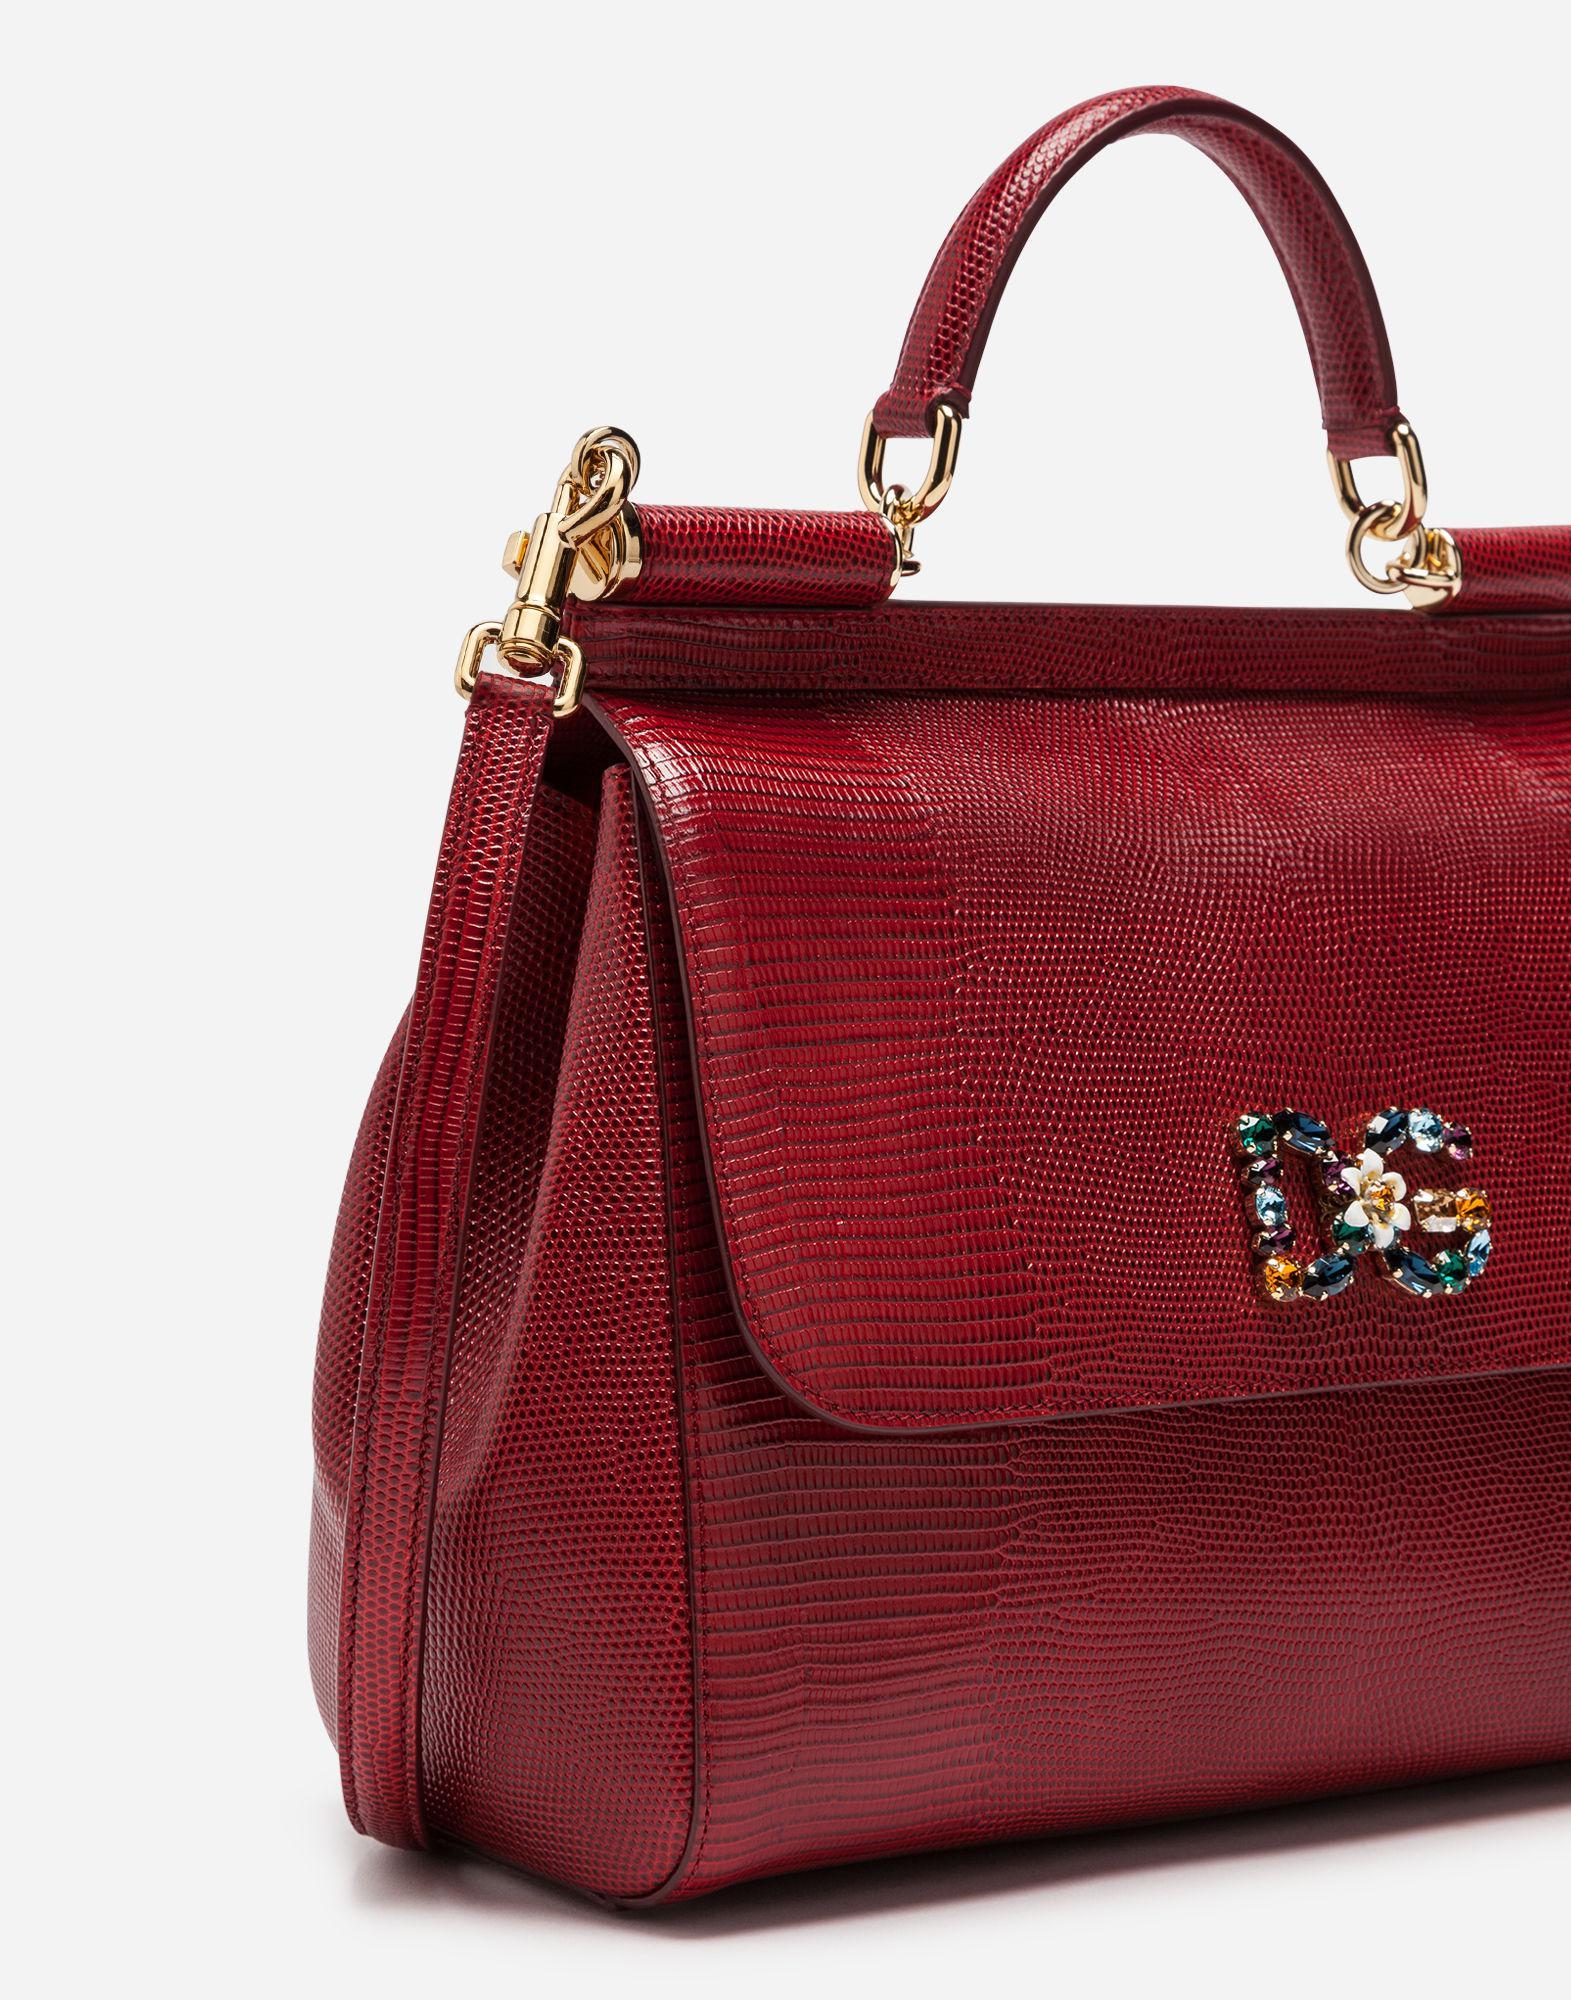 Lyst - Dolce   Gabbana Sicily Handbag In Iguana Print Calfskin And Crystal  Dg Logo Patch in Red de72a9e1fc48f